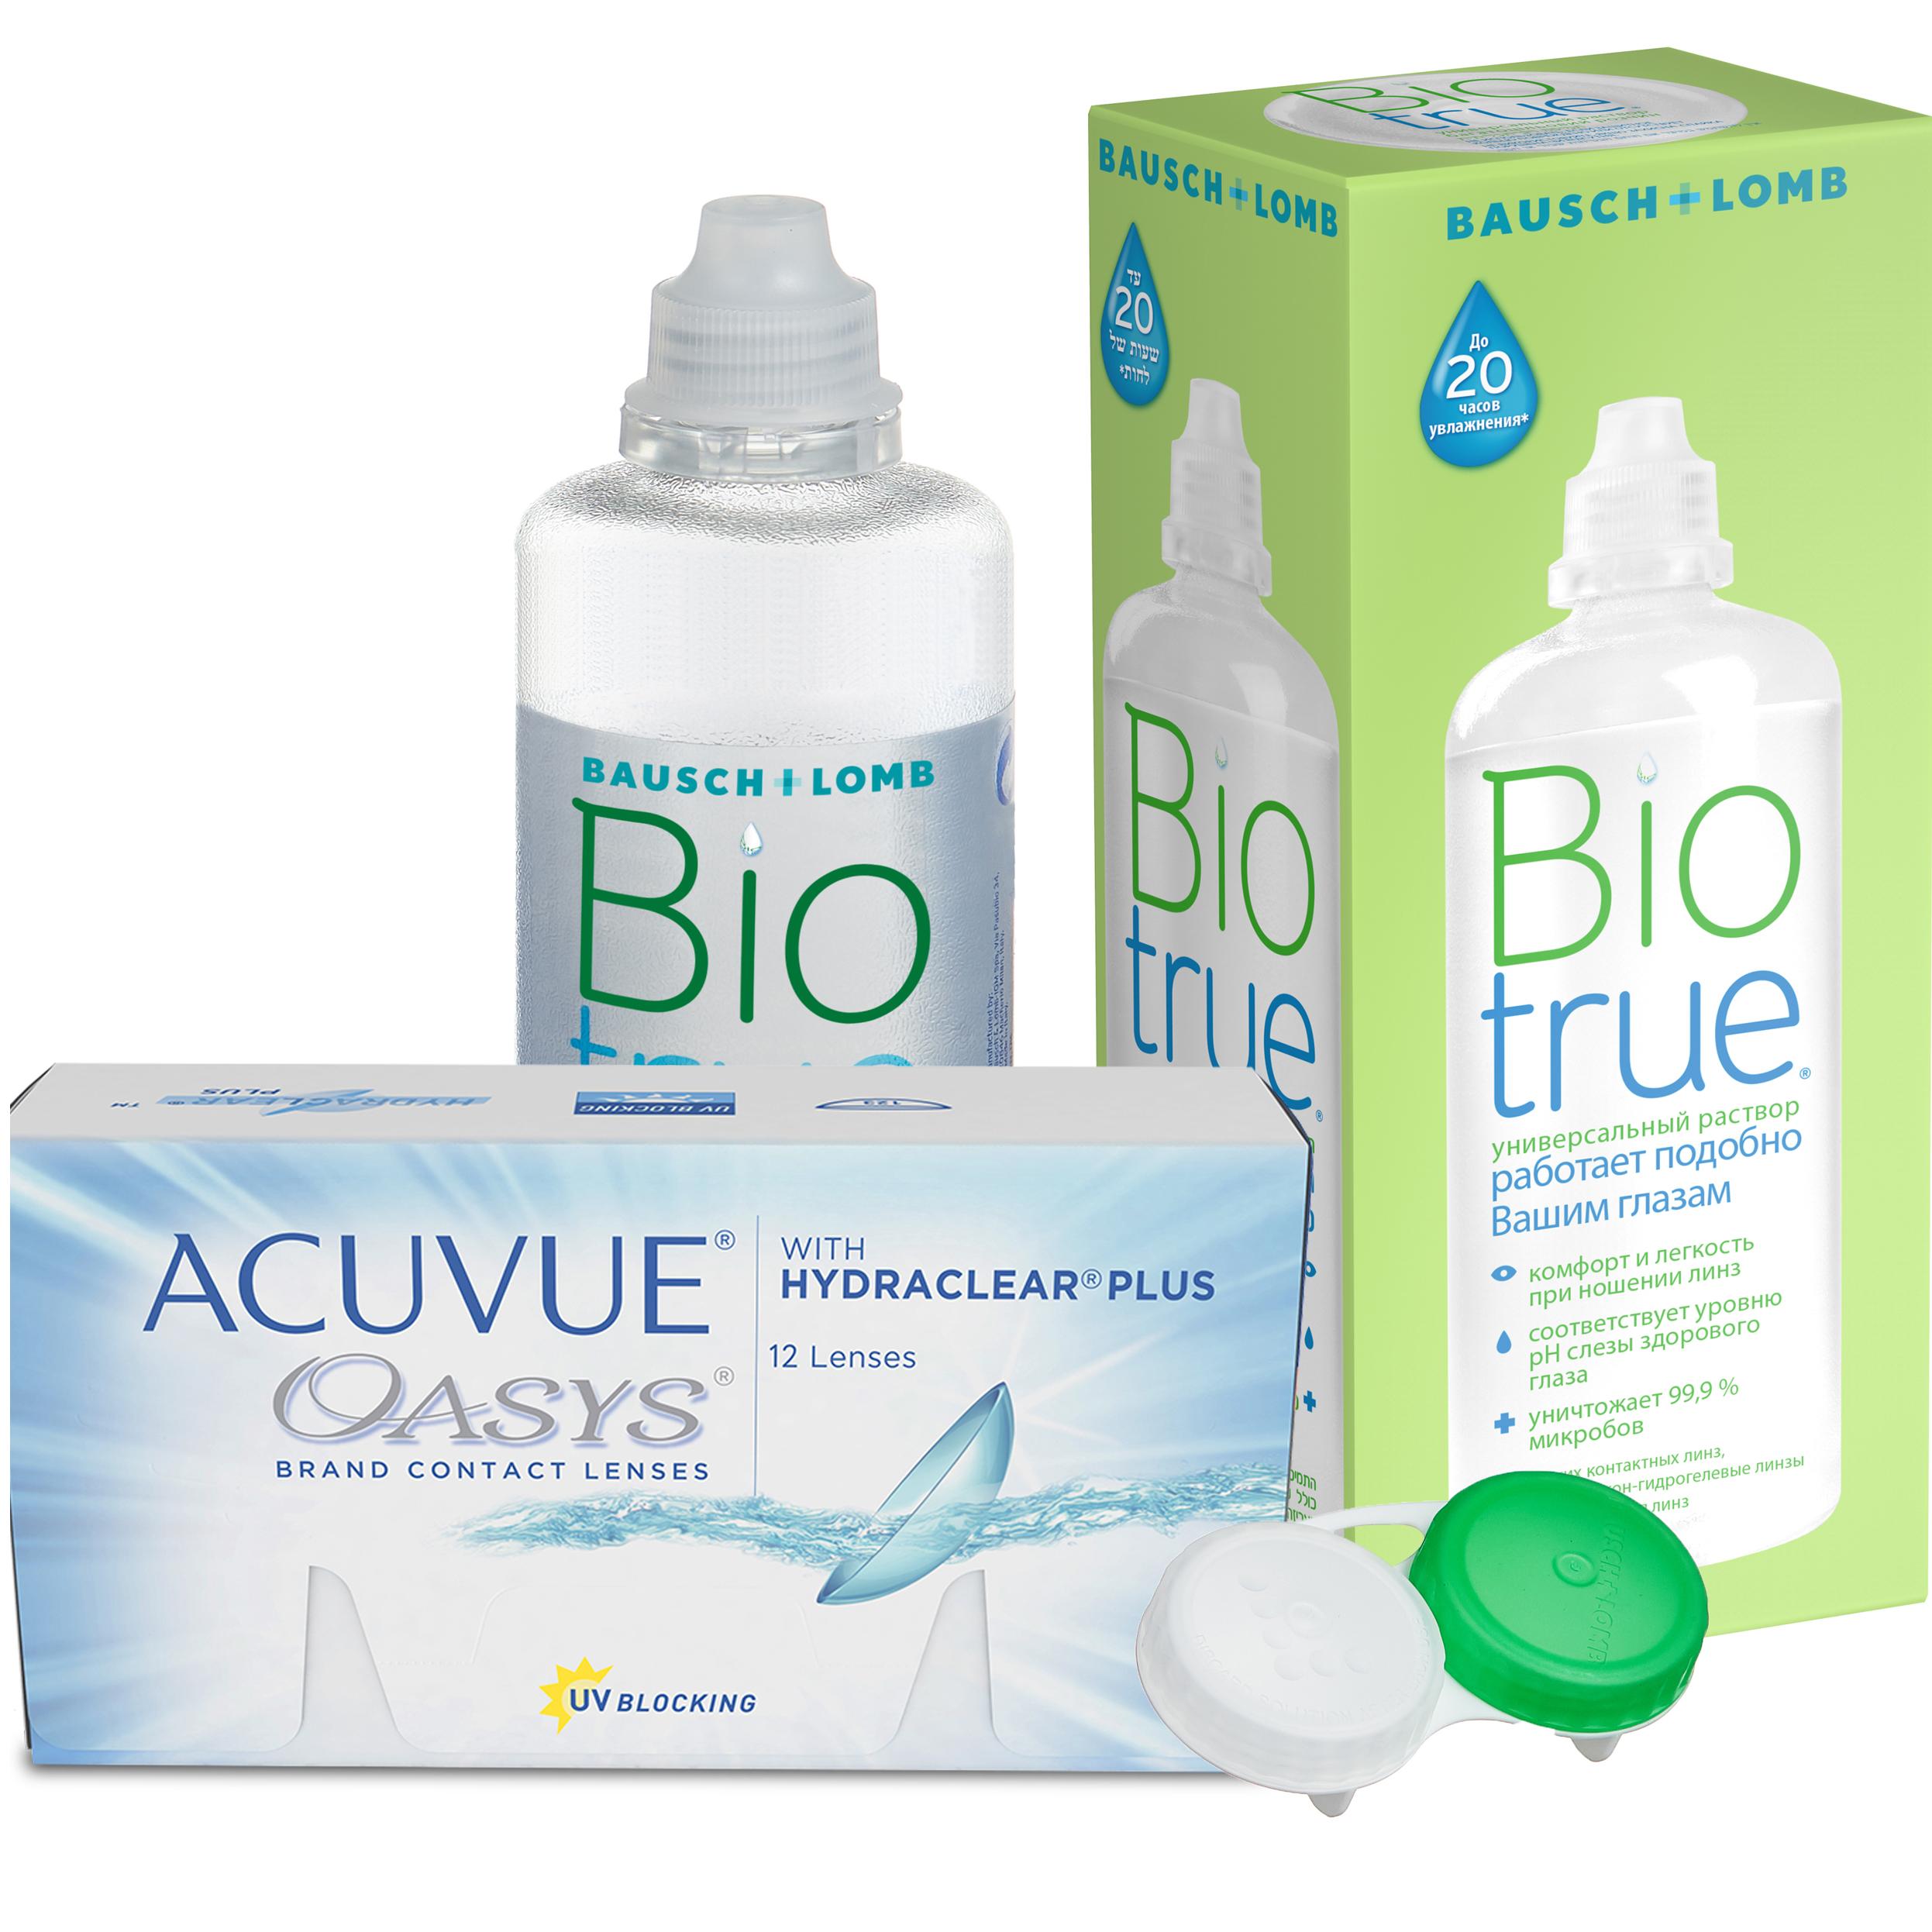 Купить Oasys with Hydraclear Plus 12 линз + Biotrue, Контактные линзы Acuvue Oasys with Hydraclear Plus 12 линз R 8.4 +6, 50 + Biotrue 300 мл